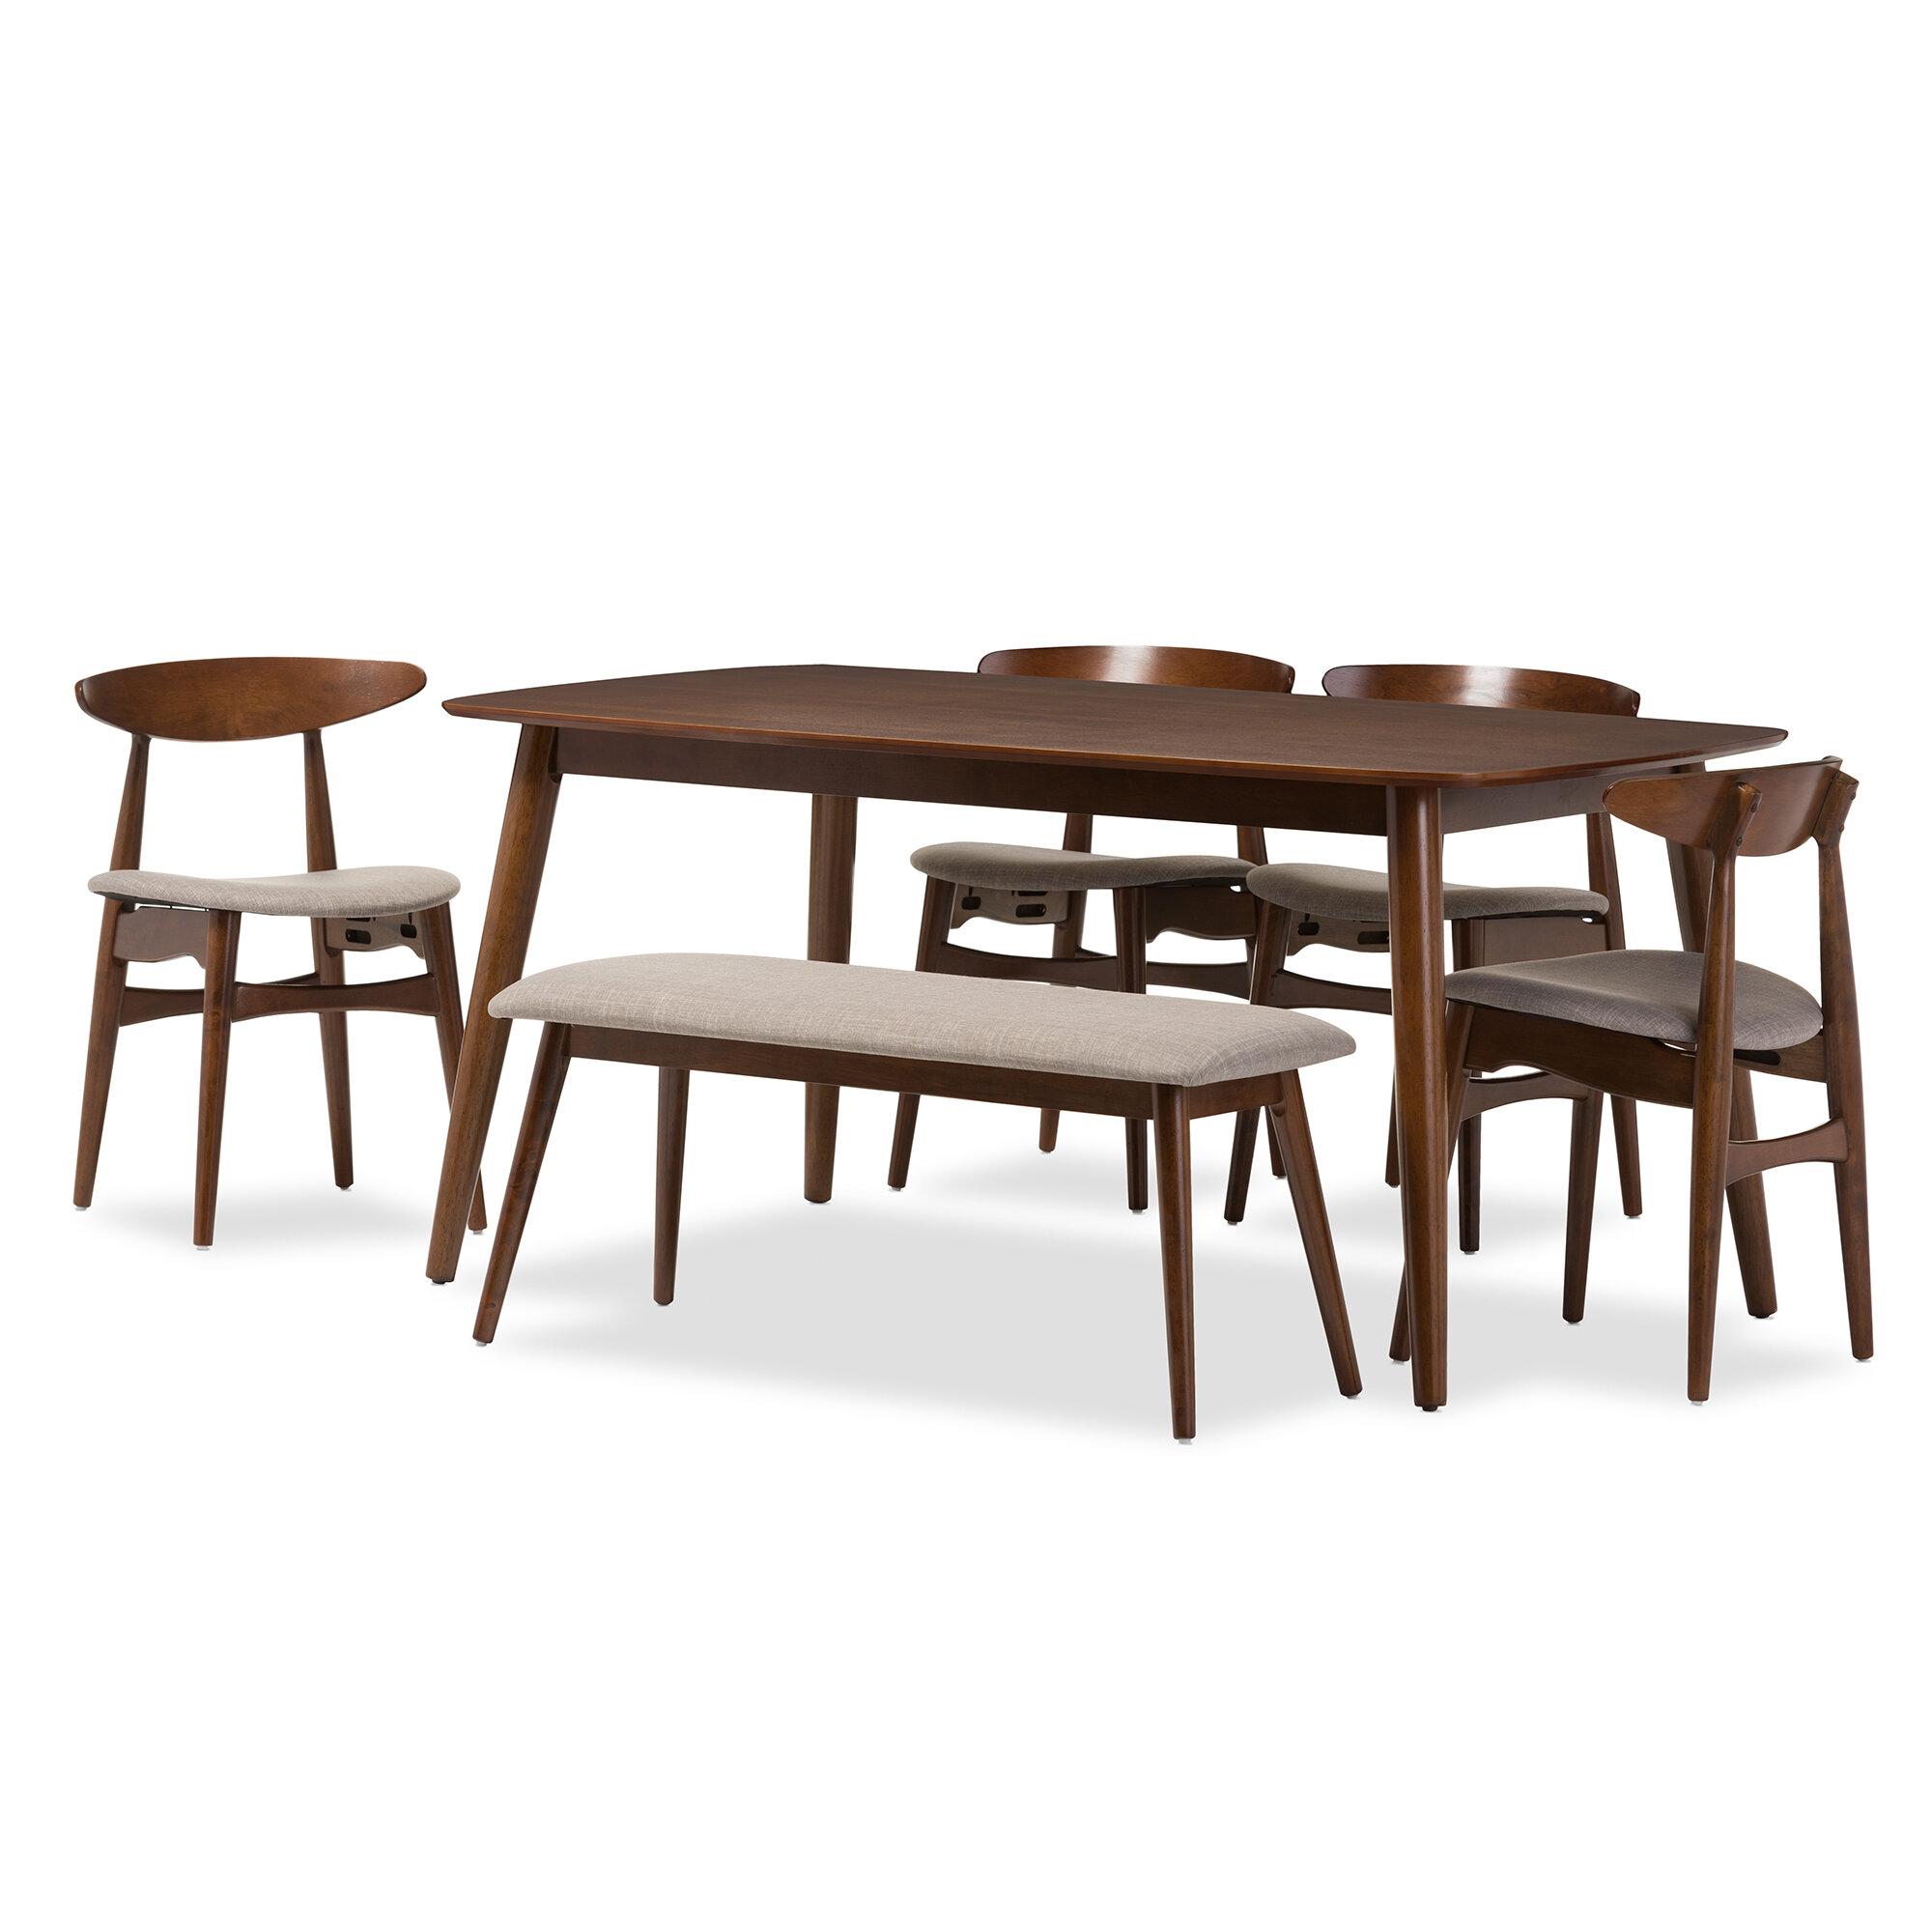 Wholesale Interiors Napoleon 6 Piece Dining Set & Reviews   Wayfair